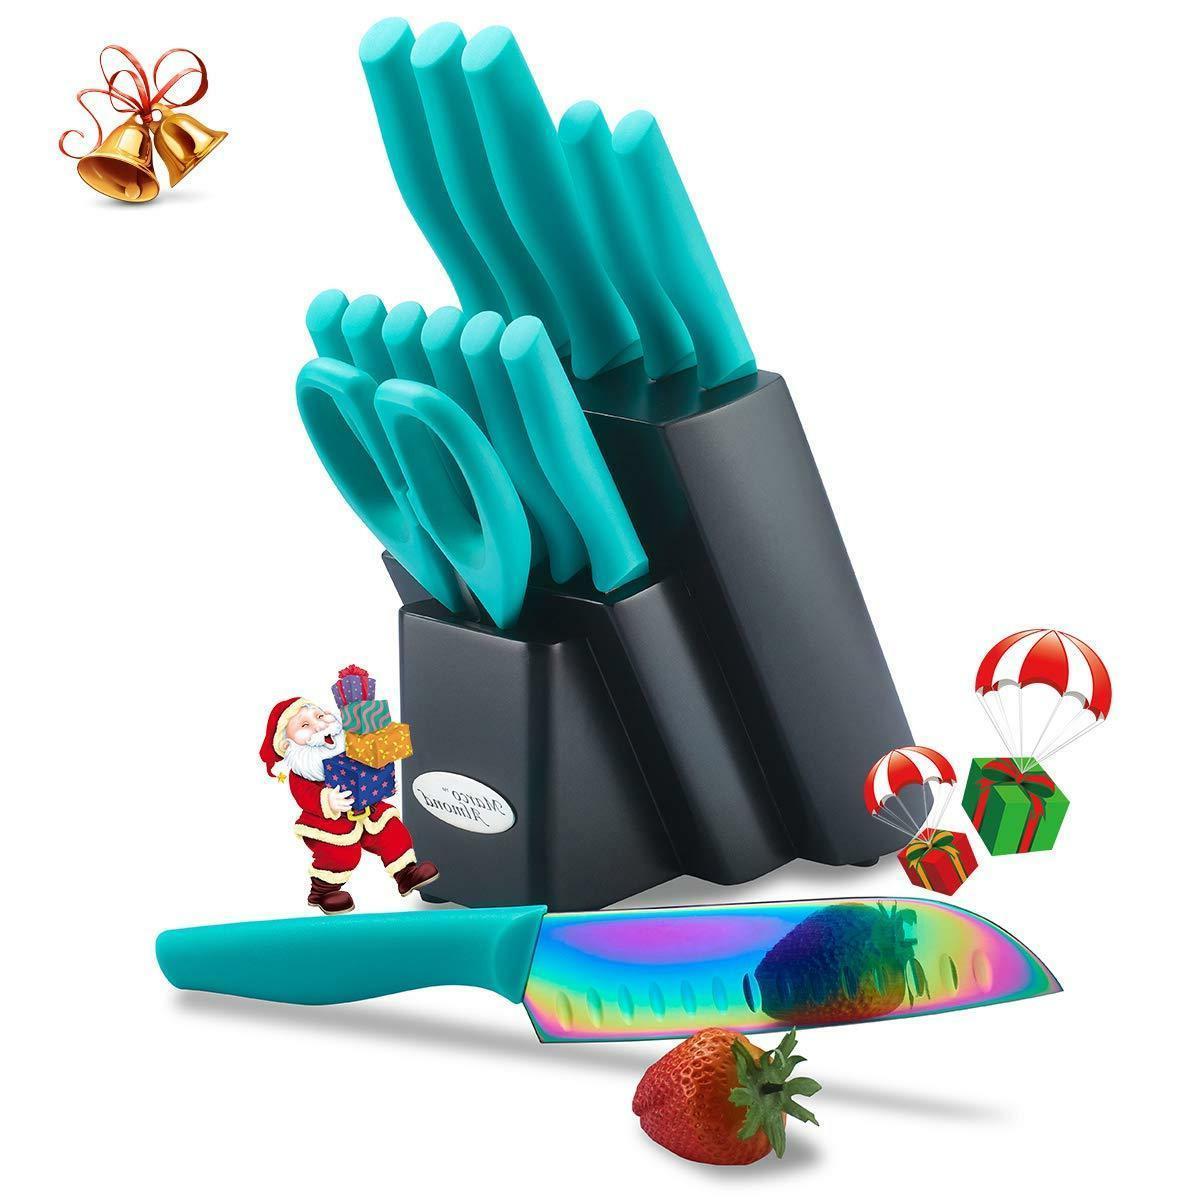 rainbow titanium knife set cutlery wooden block